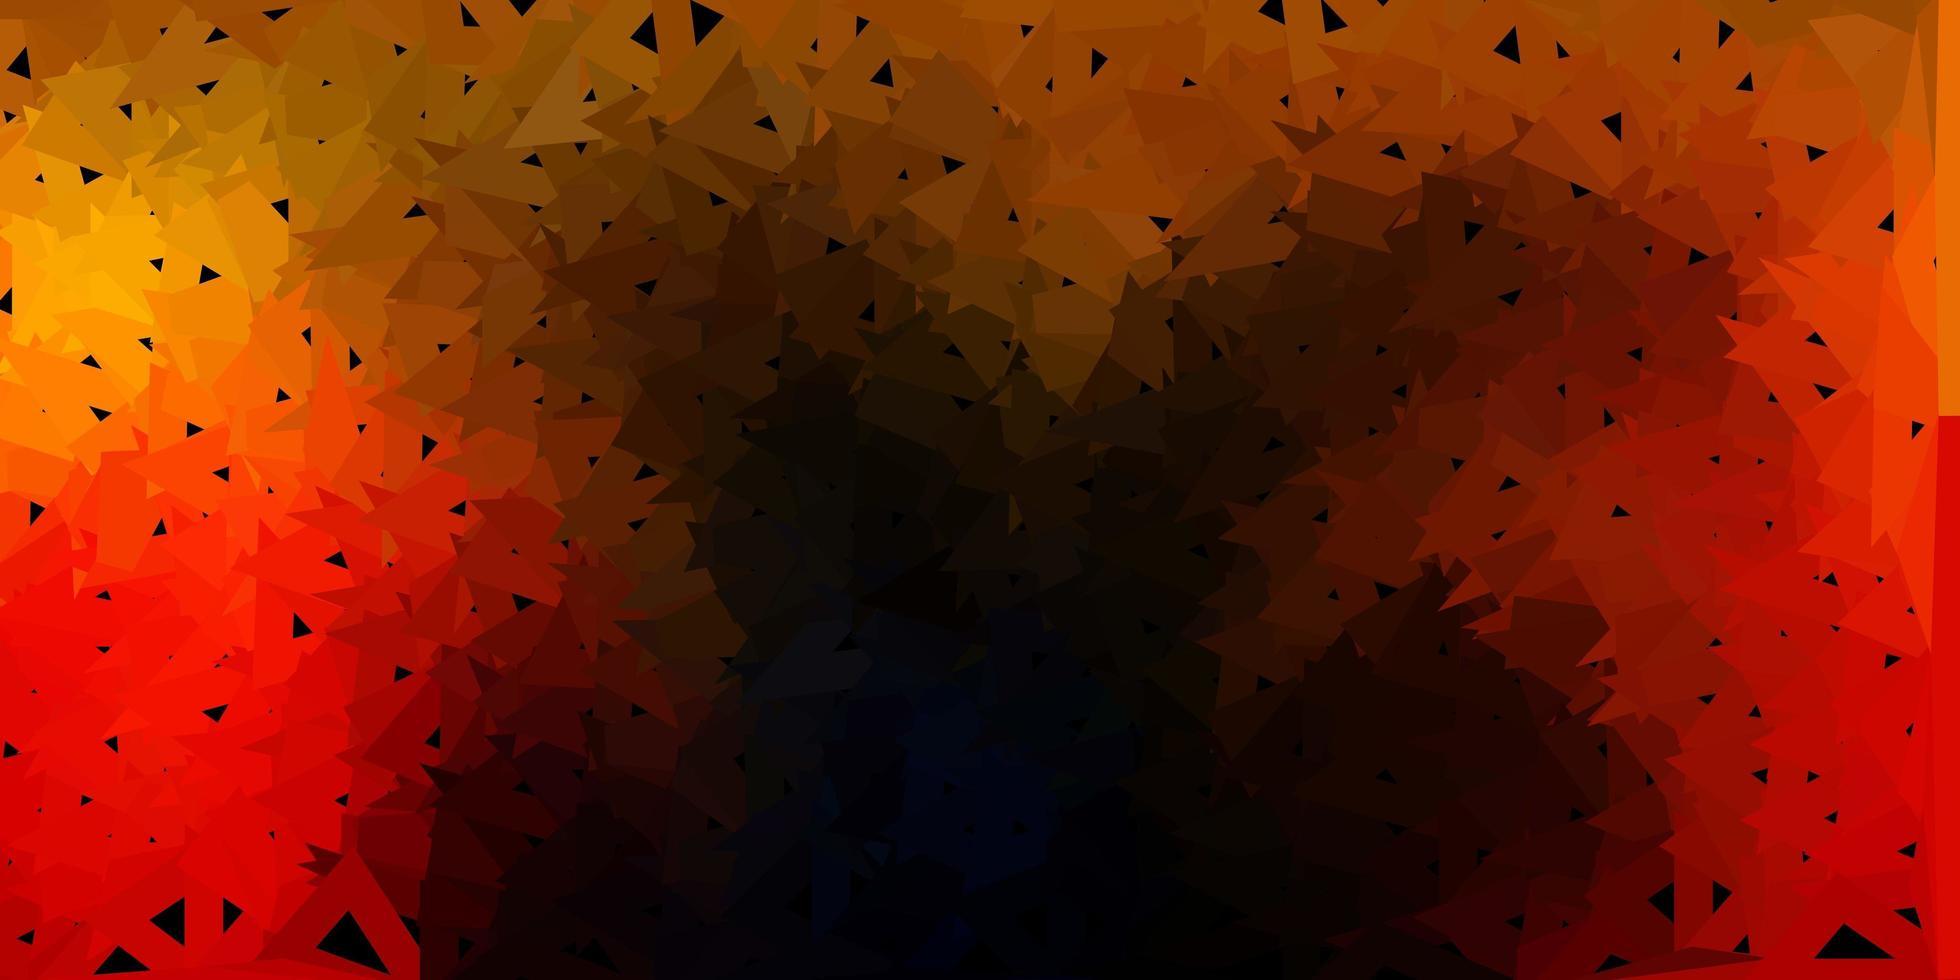 polygonaler Hintergrund des dunkelorangen Vektors. vektor